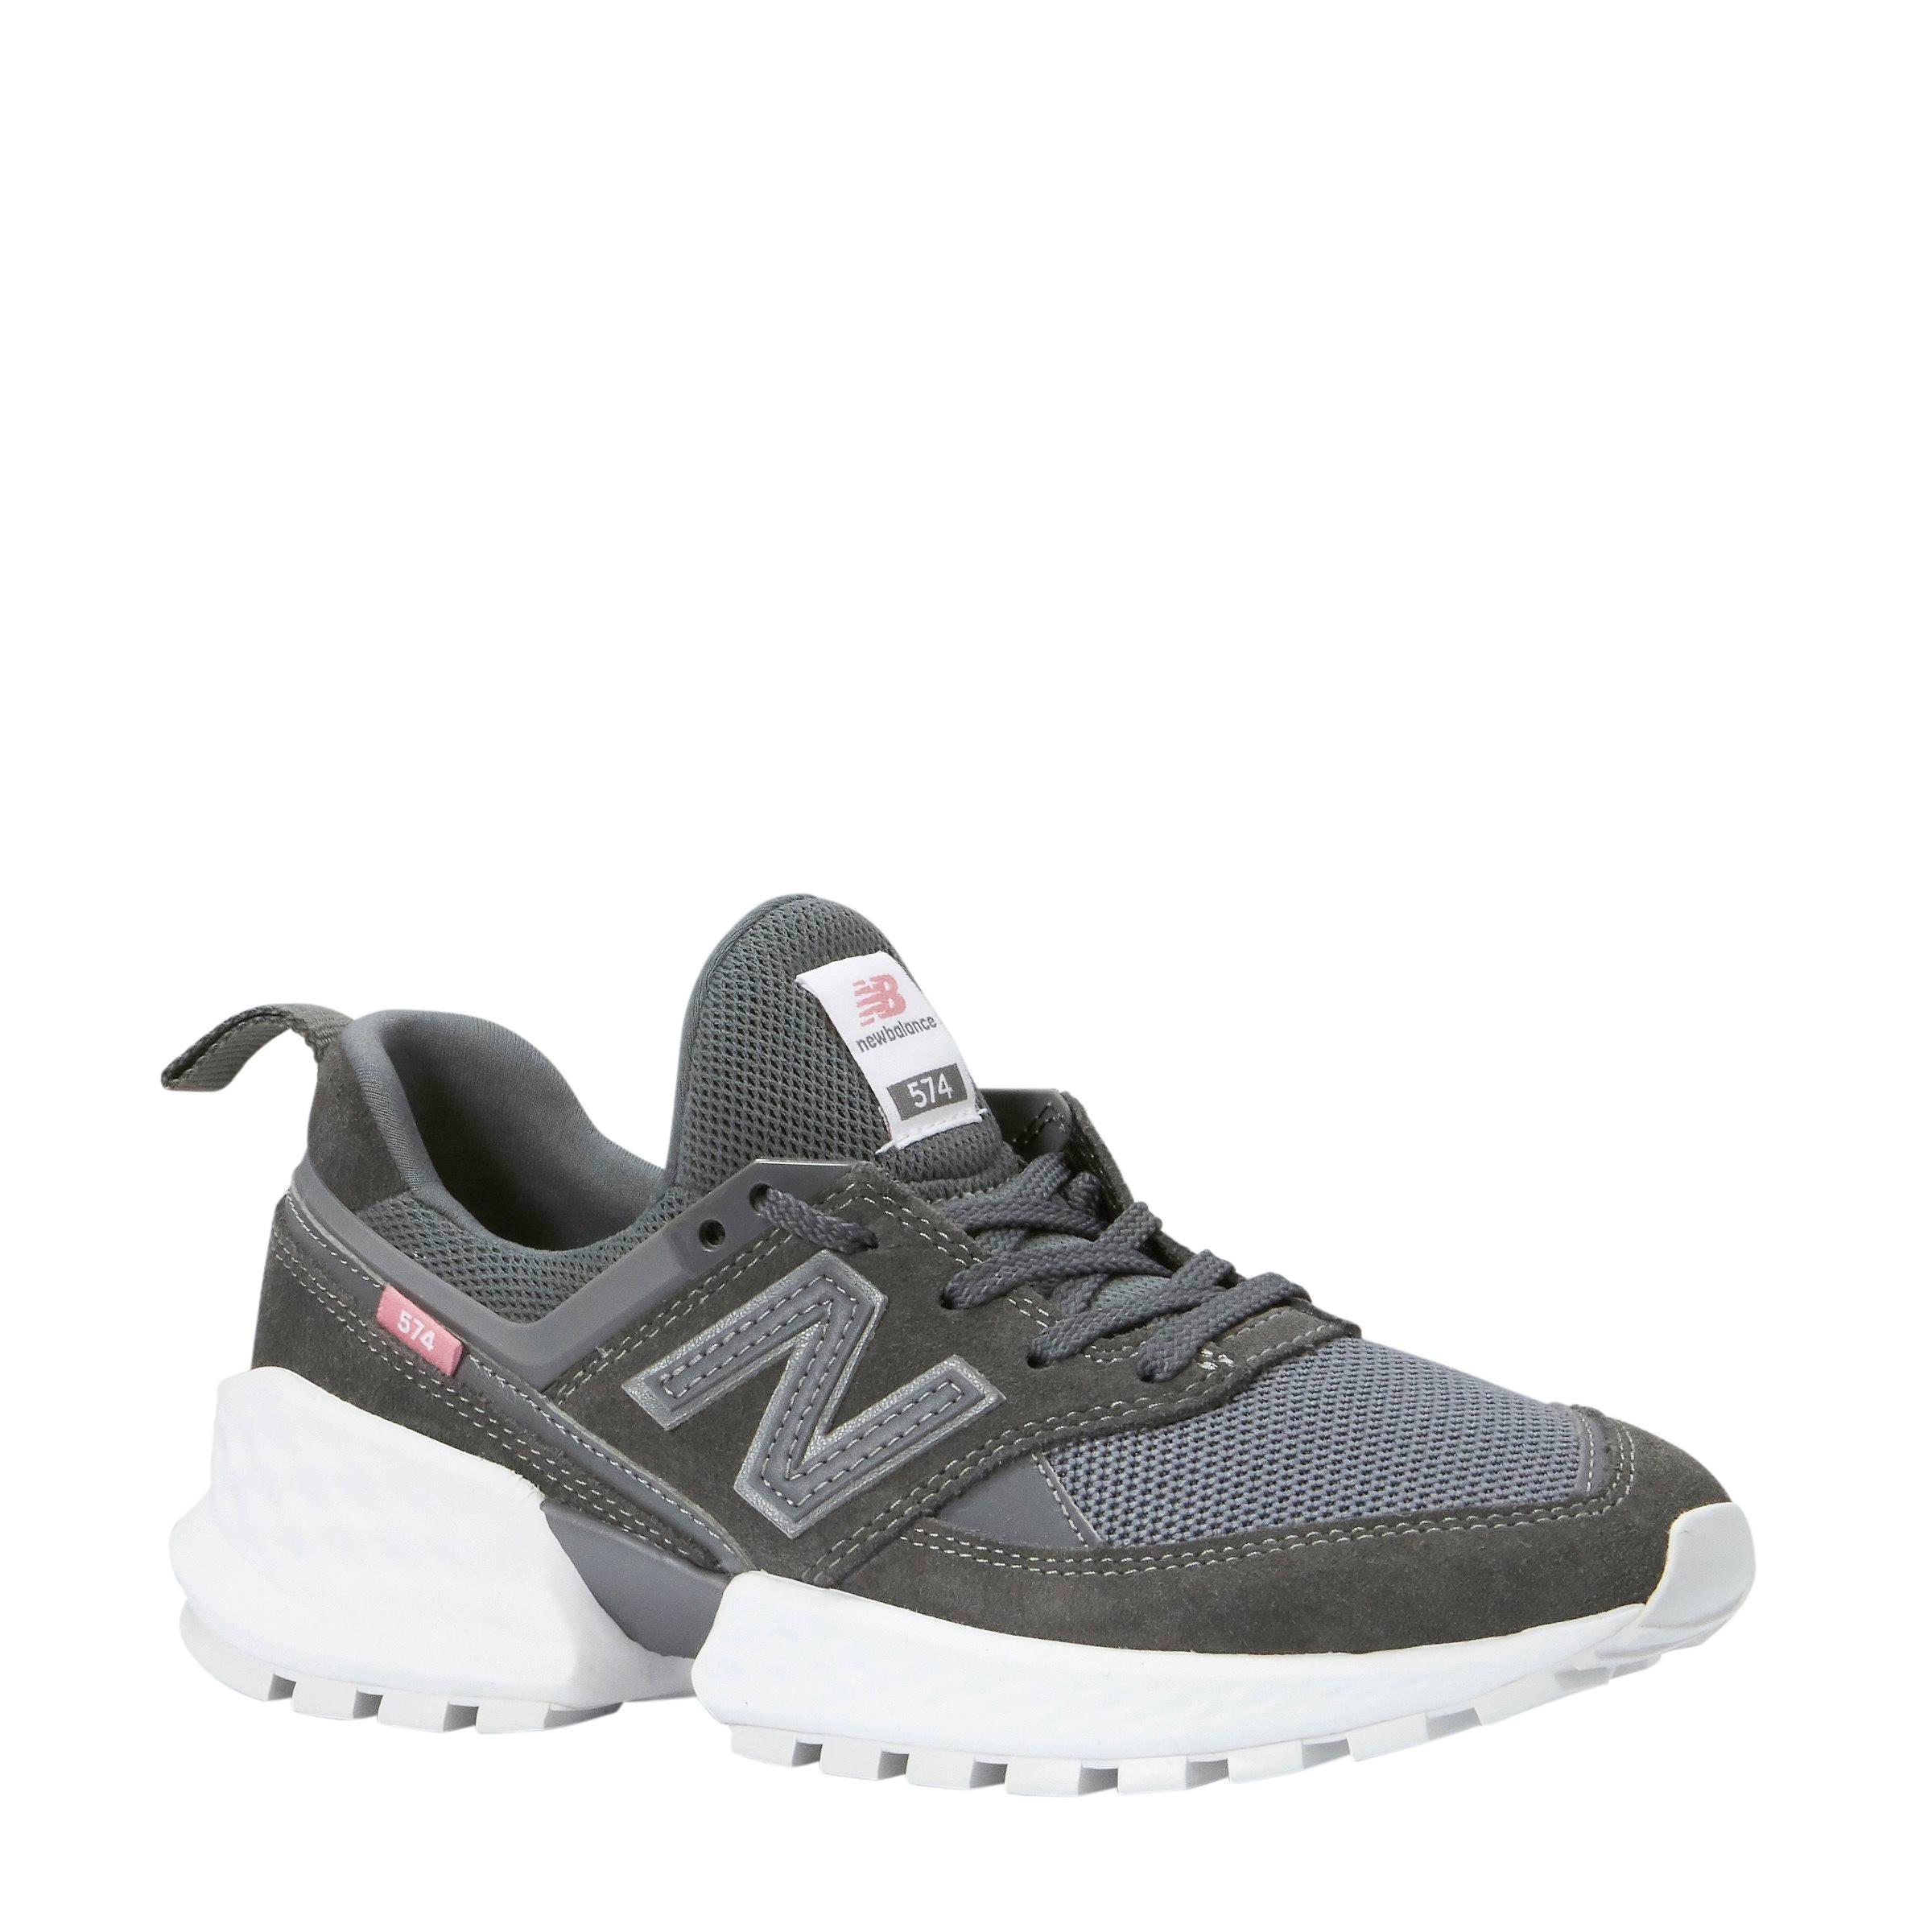 Balance Wehkamp Bezorging Gratis Vanaf 20 Bij Sneakers New dqWaSd